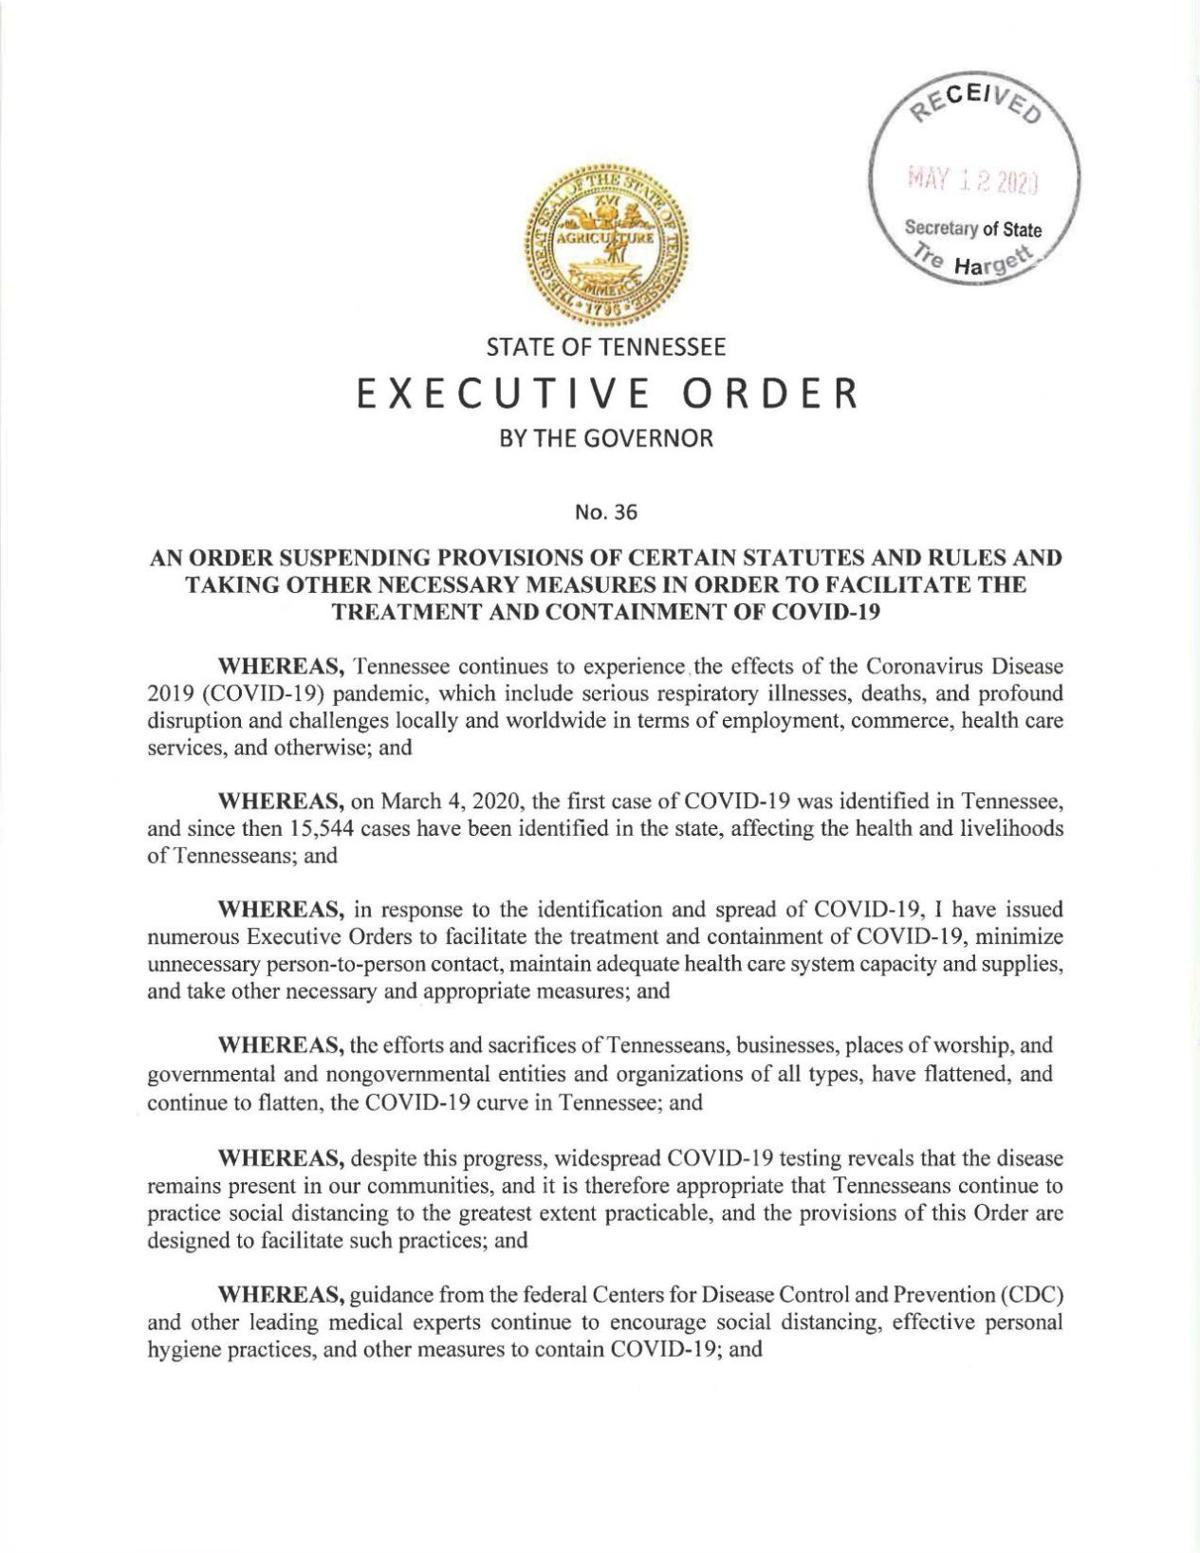 Gov. Bill Lee Executive Orders 36, 38, 49, 50, 51, 52